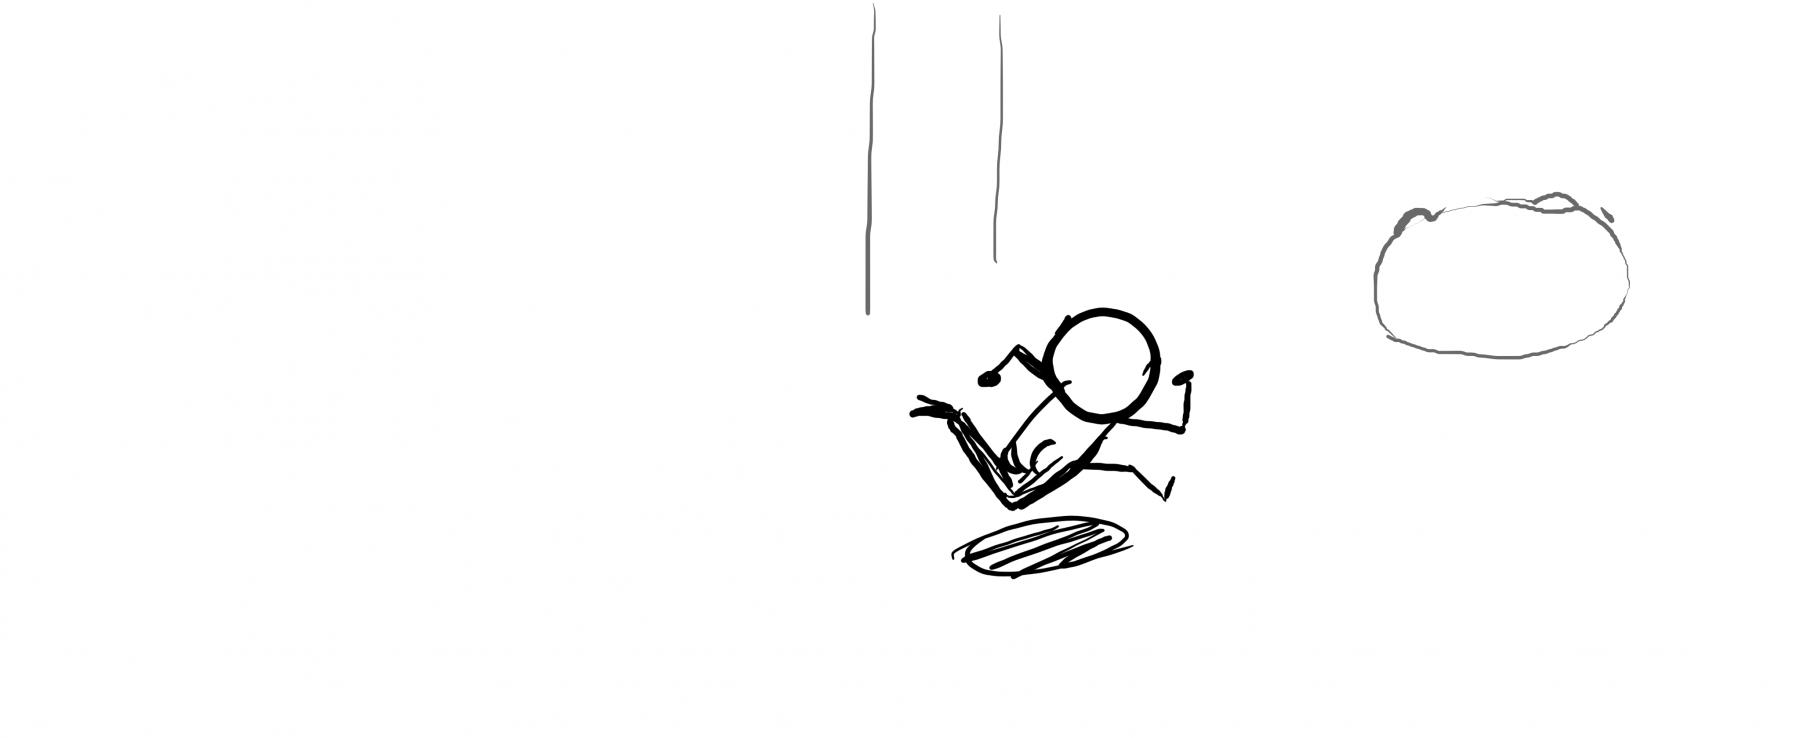 Nut-Thumbnail-Rough-Board00279